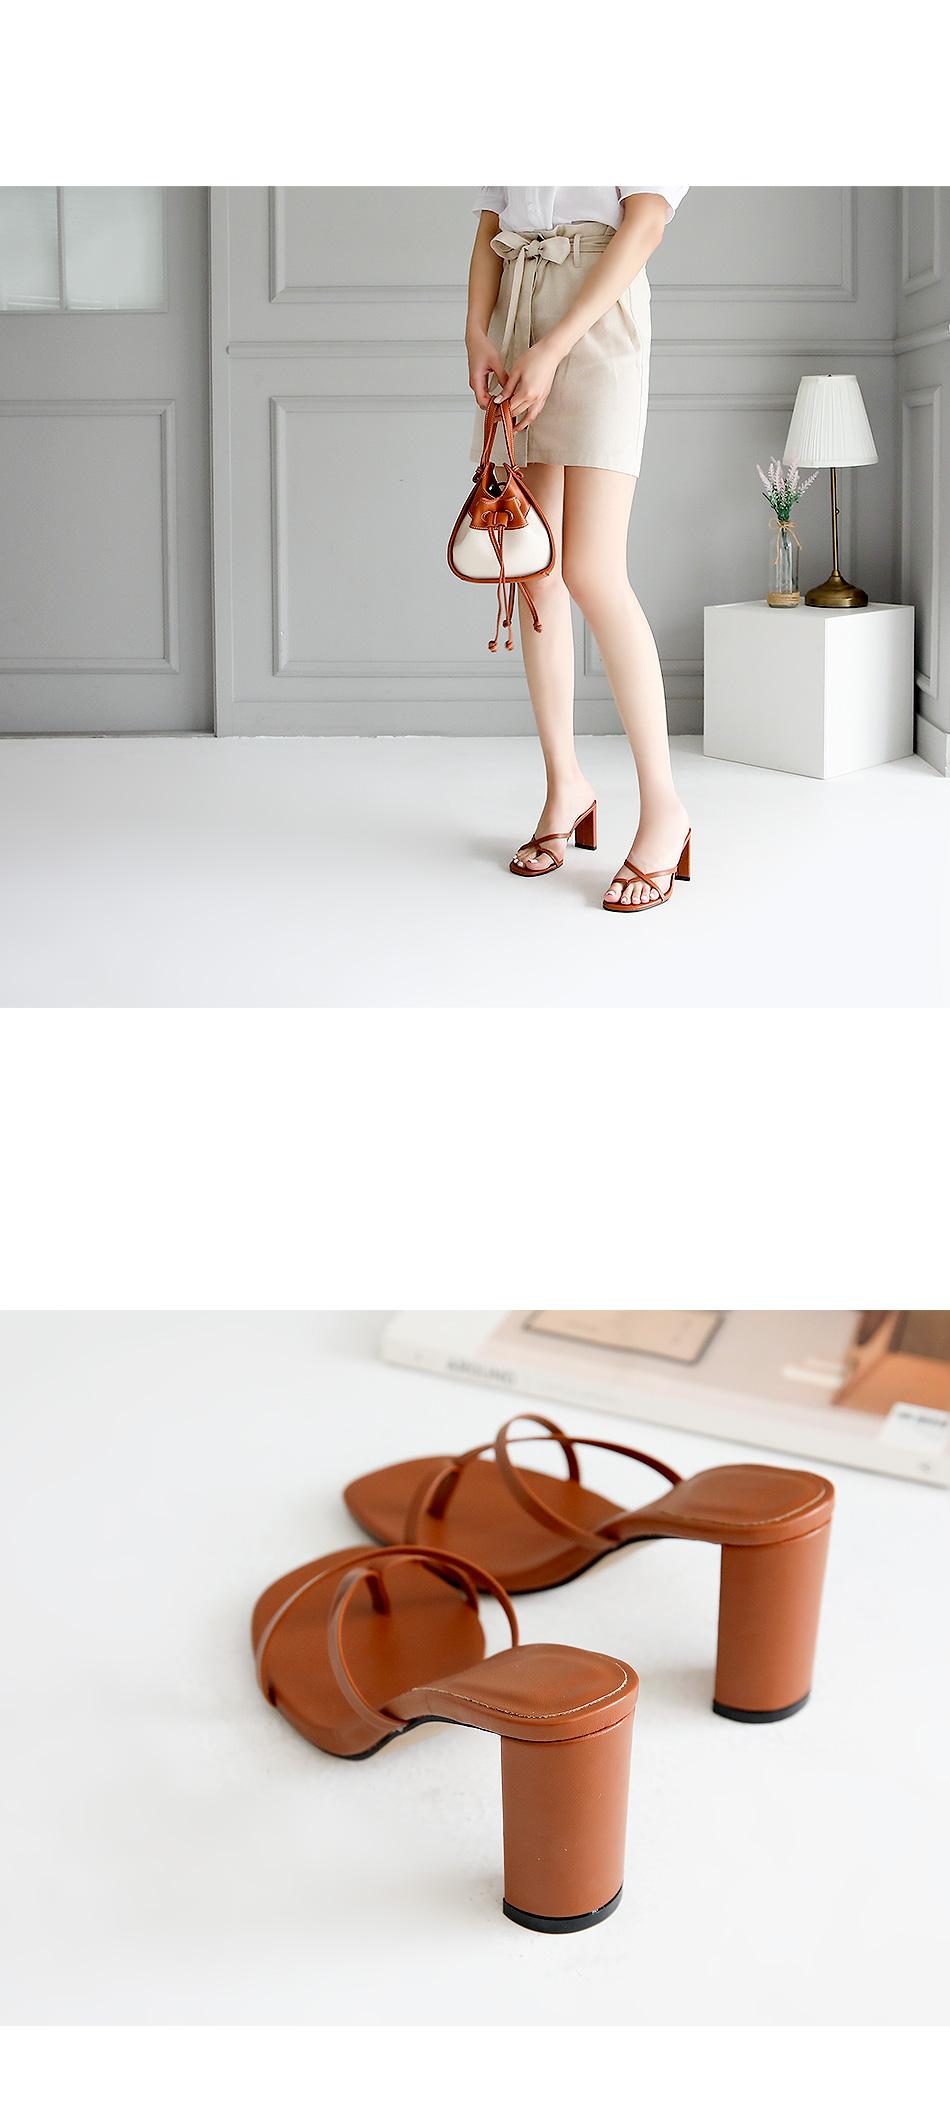 Eniassa mule slippers 8cm